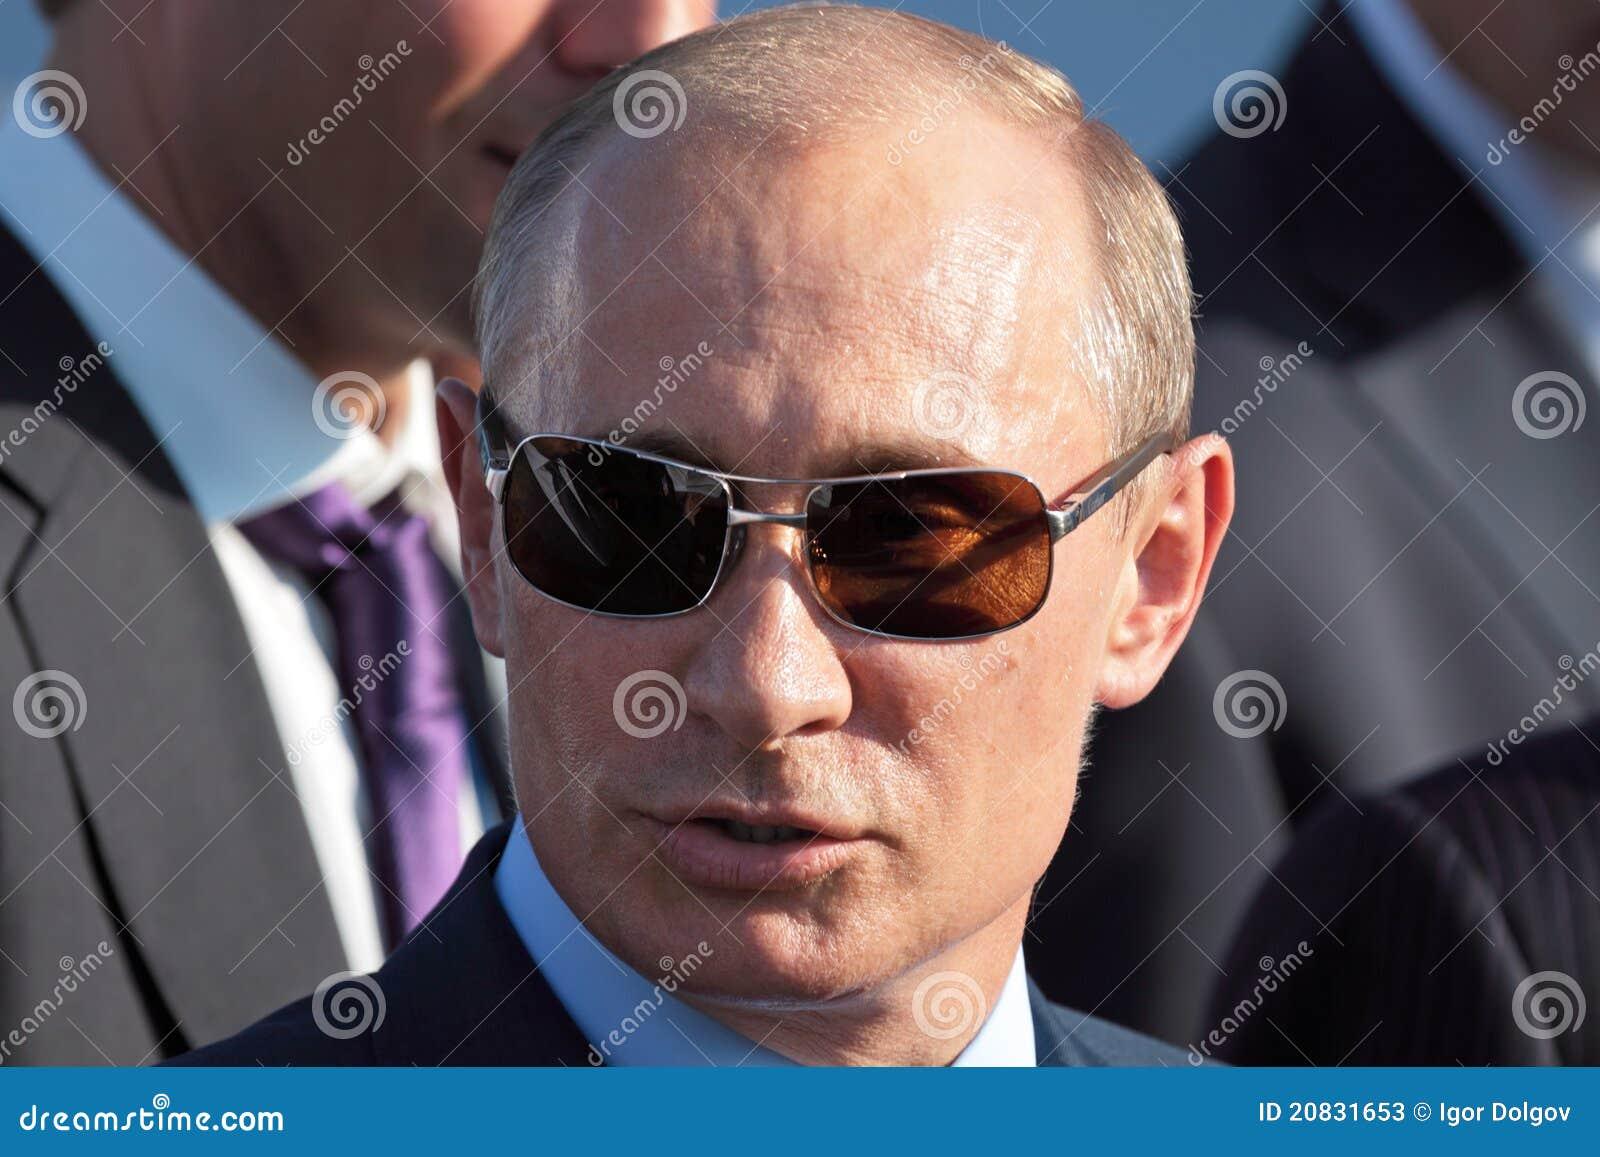 Vladimir Zhukovsky shared a photo 98